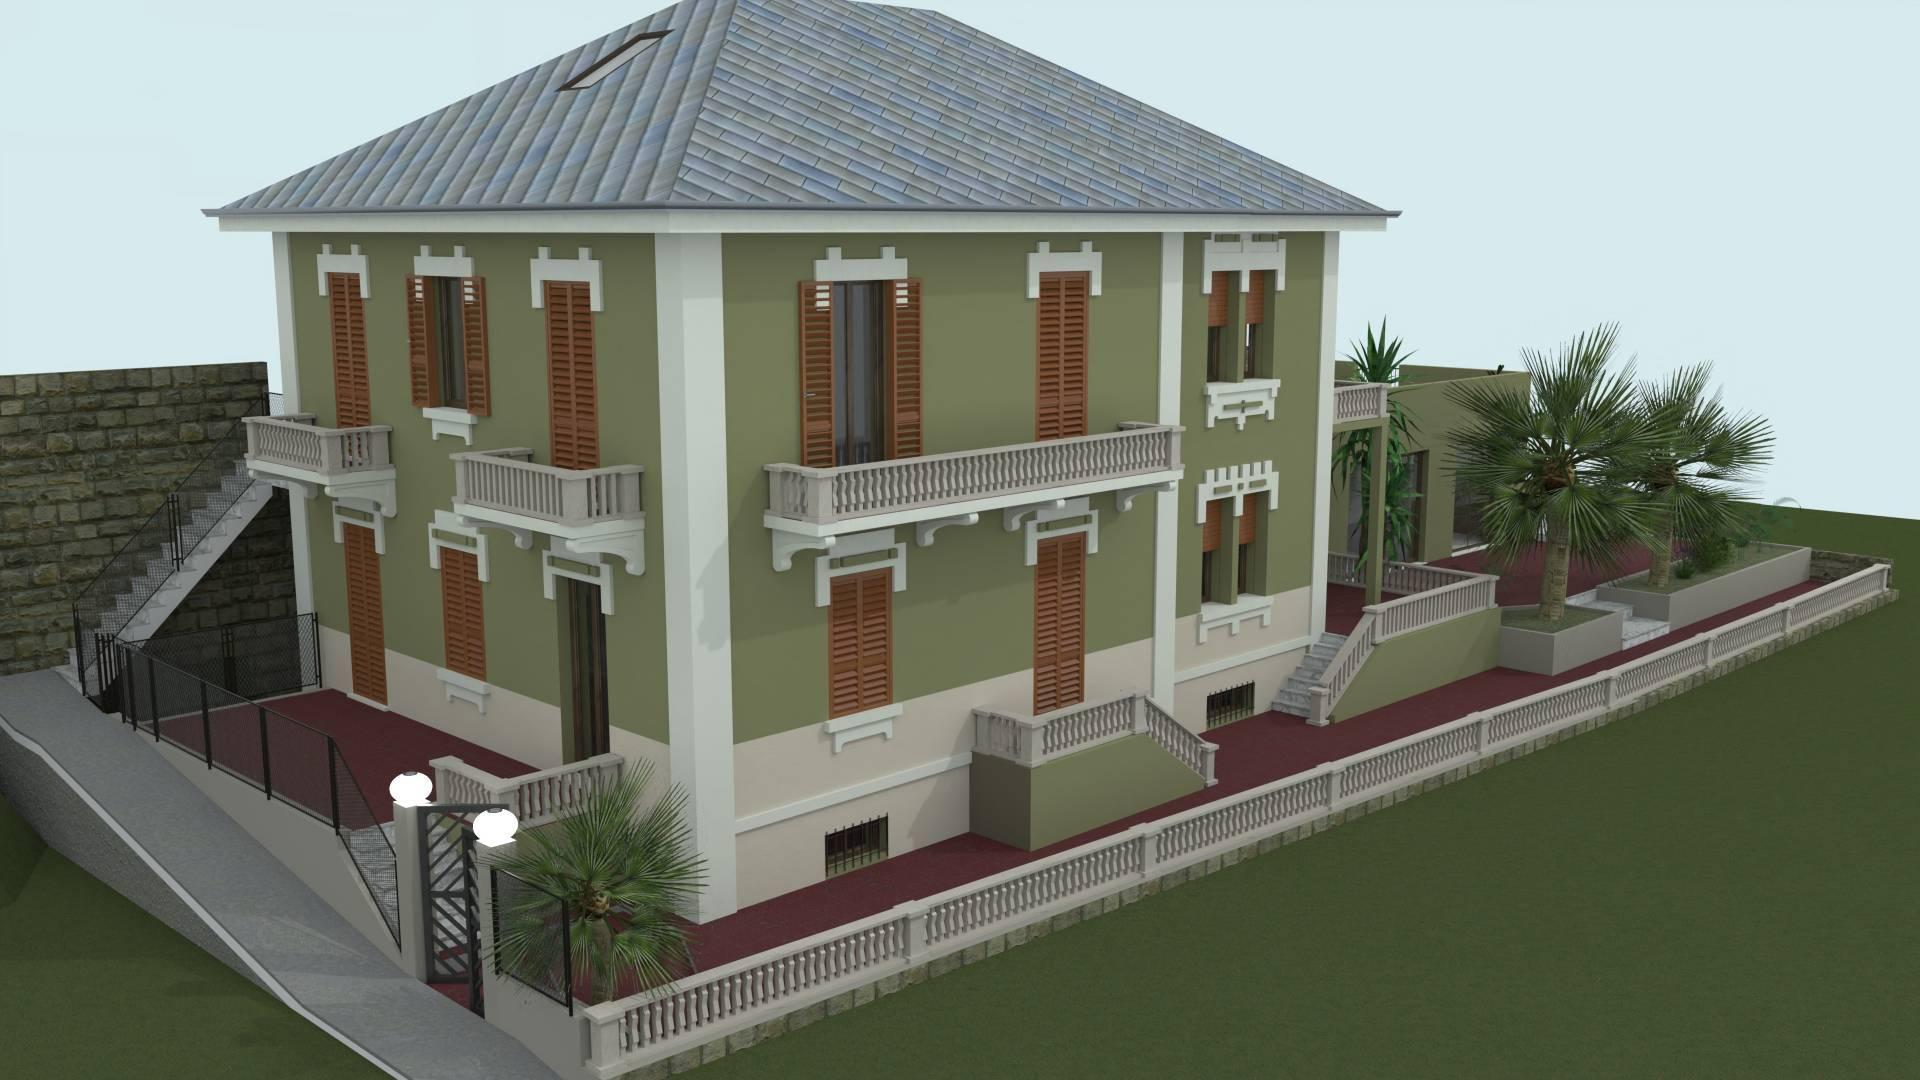 Agenzie Immobiliari Varazze appartamento in vendita a varazze cod. vag p14